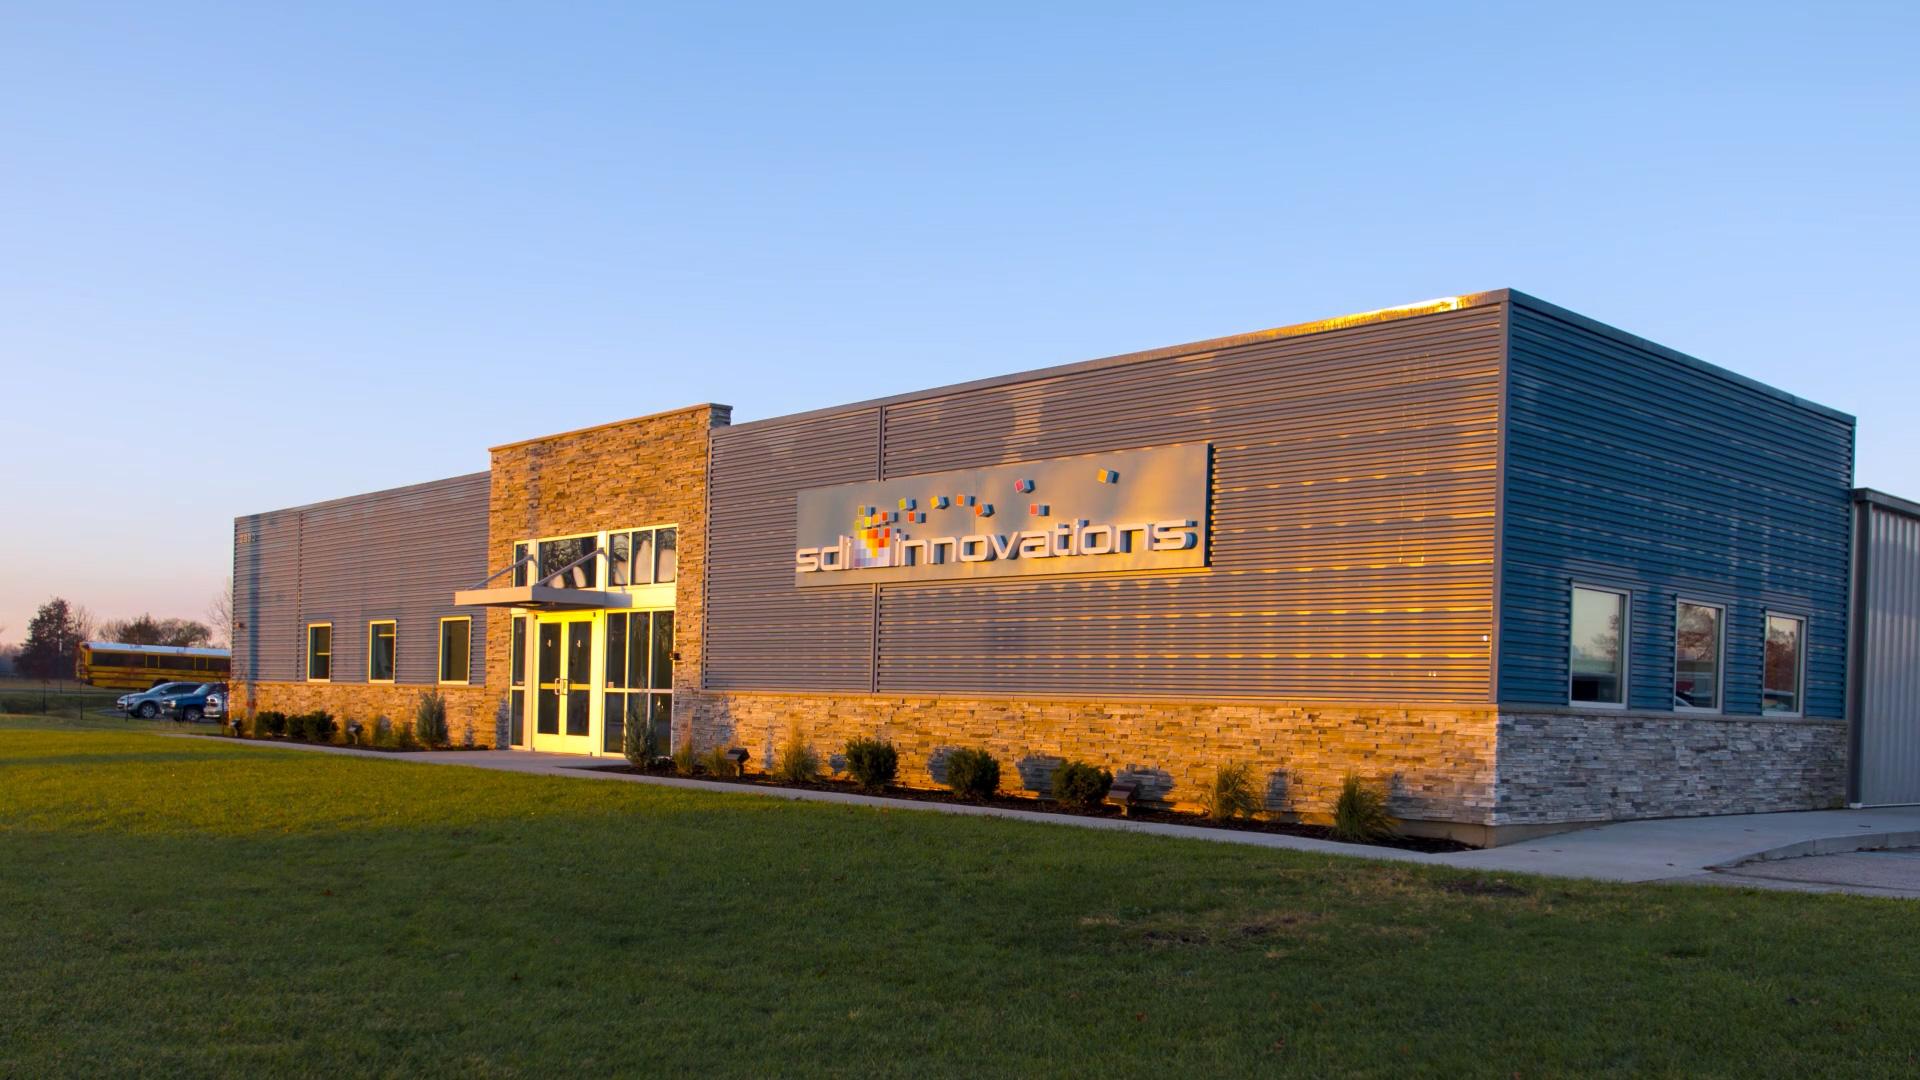 Exterior view of SDI Innovations building.